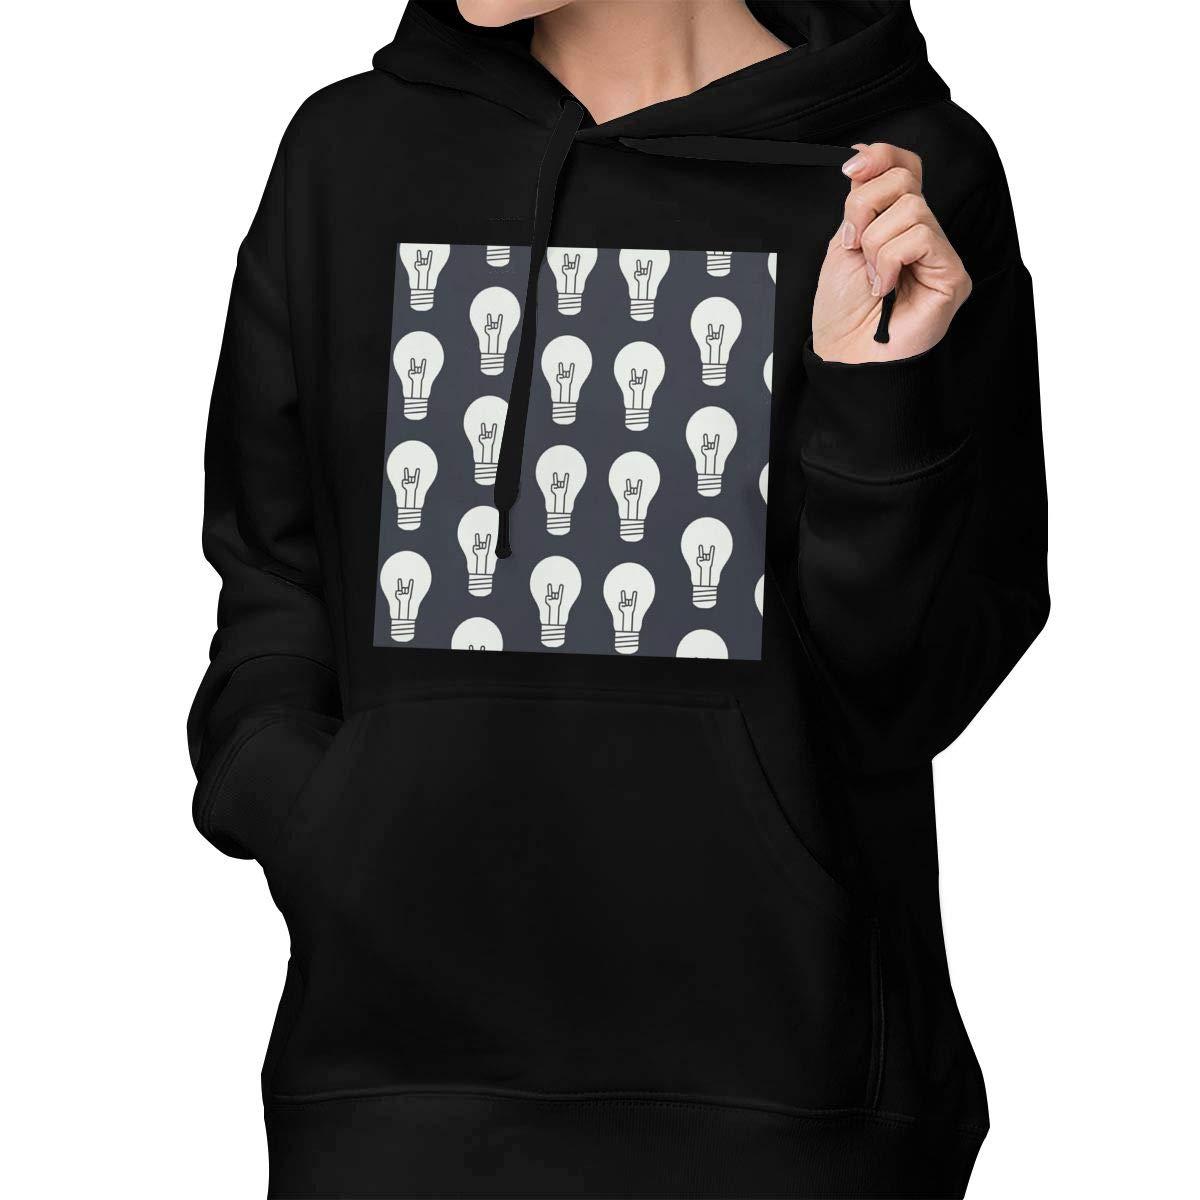 Hand Gestures in Light Bulb Hoodie Womens Casual Zip-up Sweatshirts Jackets Coats Pullover Hoodie with Drawstring Hood